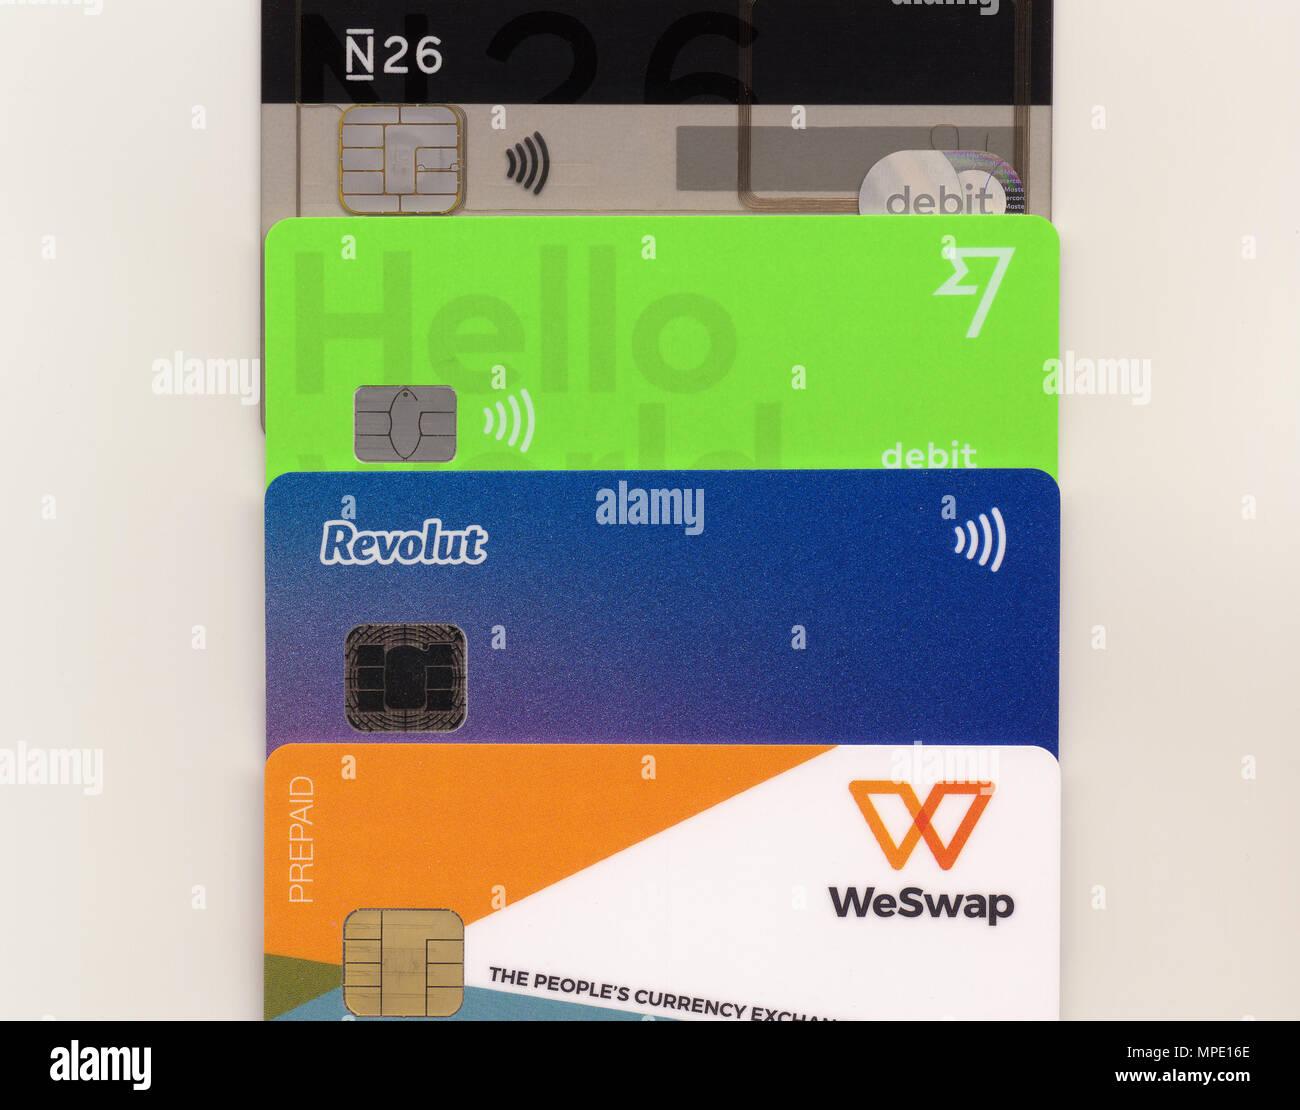 Transferwise Card Stock Photos & Transferwise Card Stock